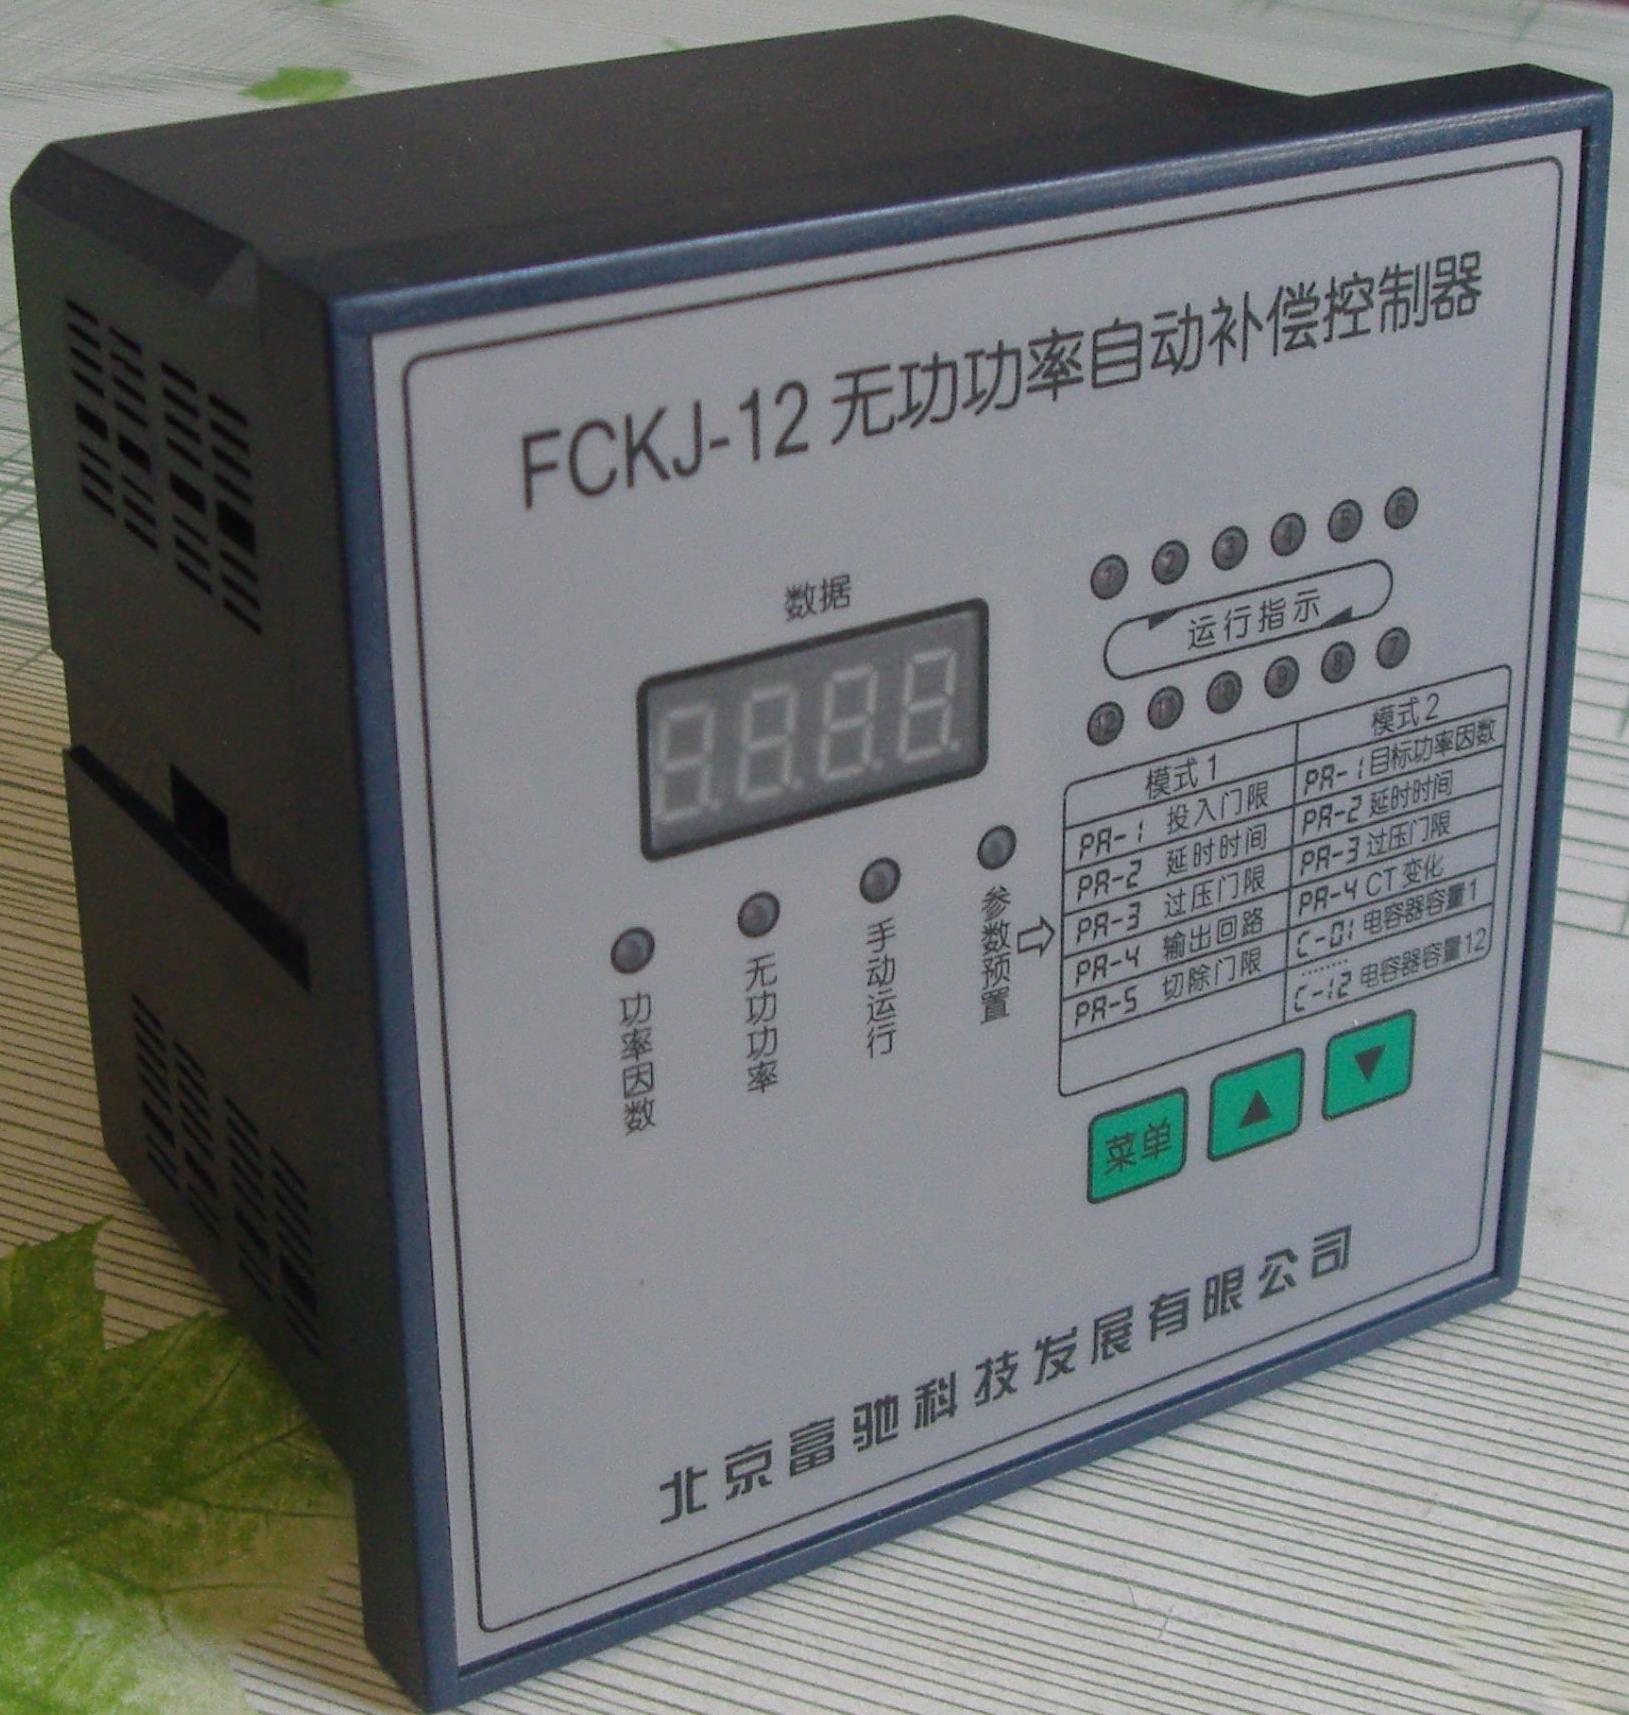 fckj-12无功功率补偿控制器